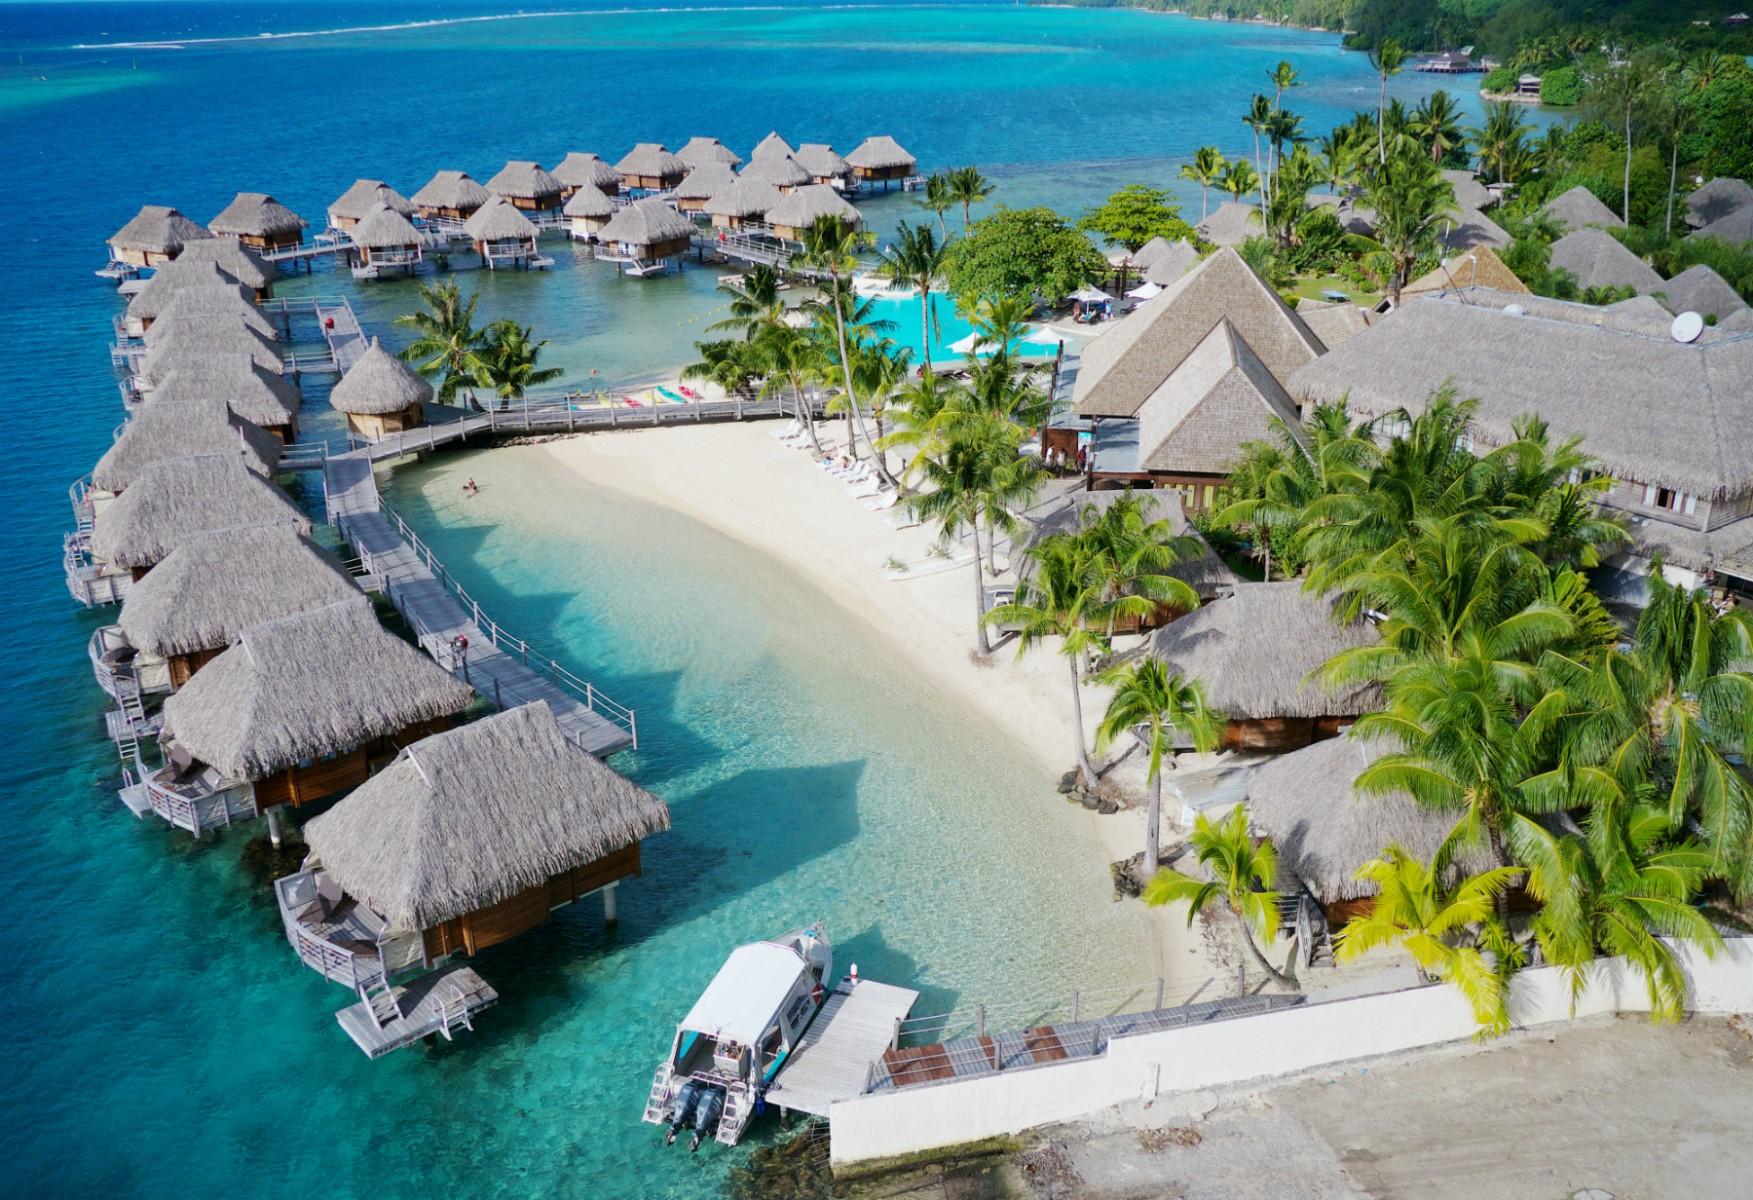 https://tahititourisme.com/wp-content/uploads/2020/08/Manava-Beach-Resort-Moorea.jpg